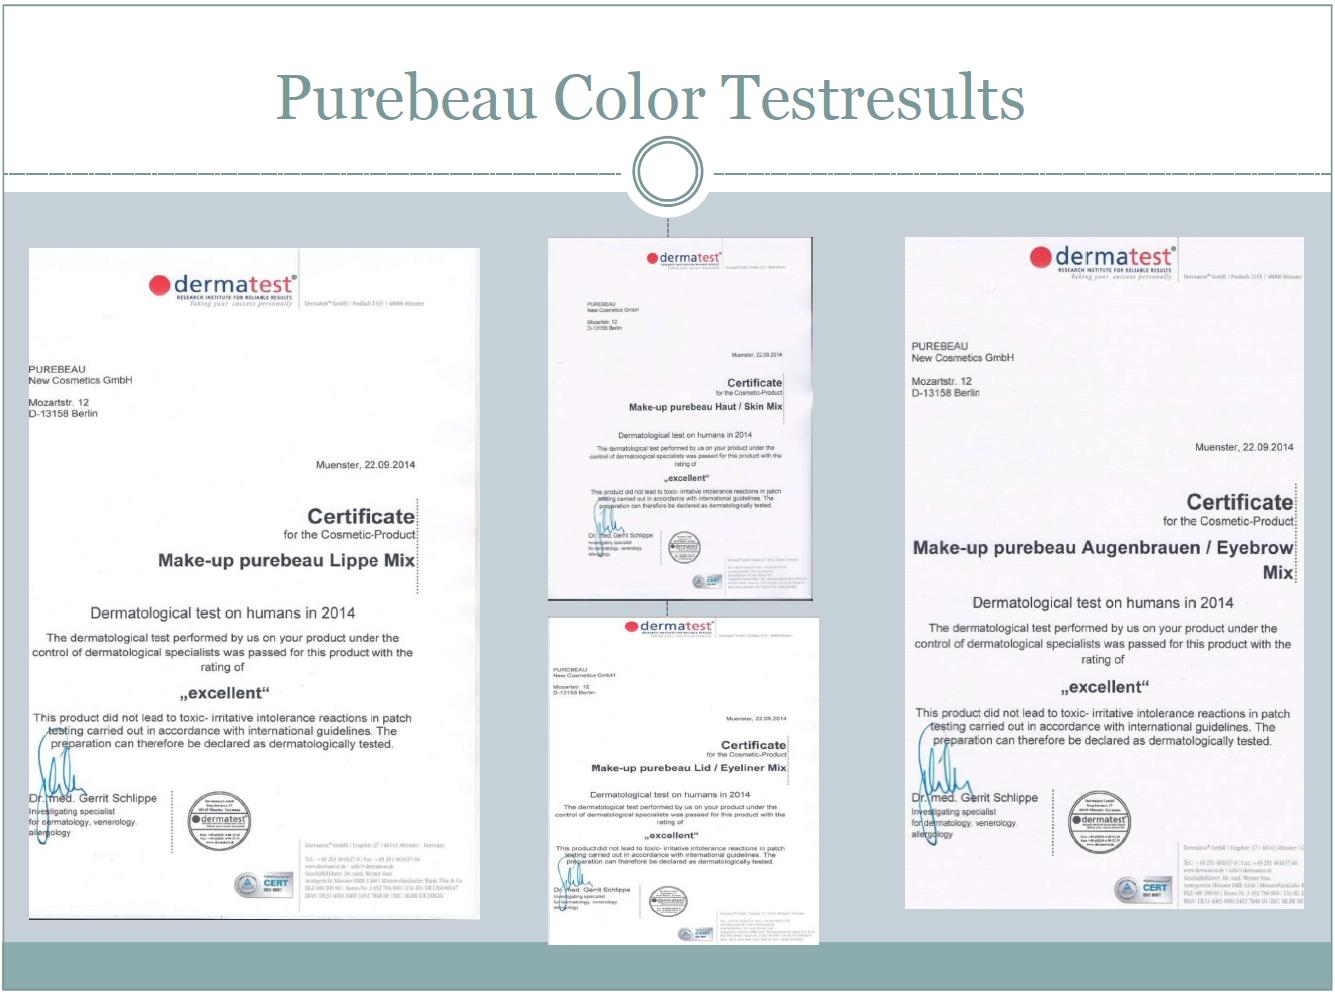 Purebeau Color Testresults